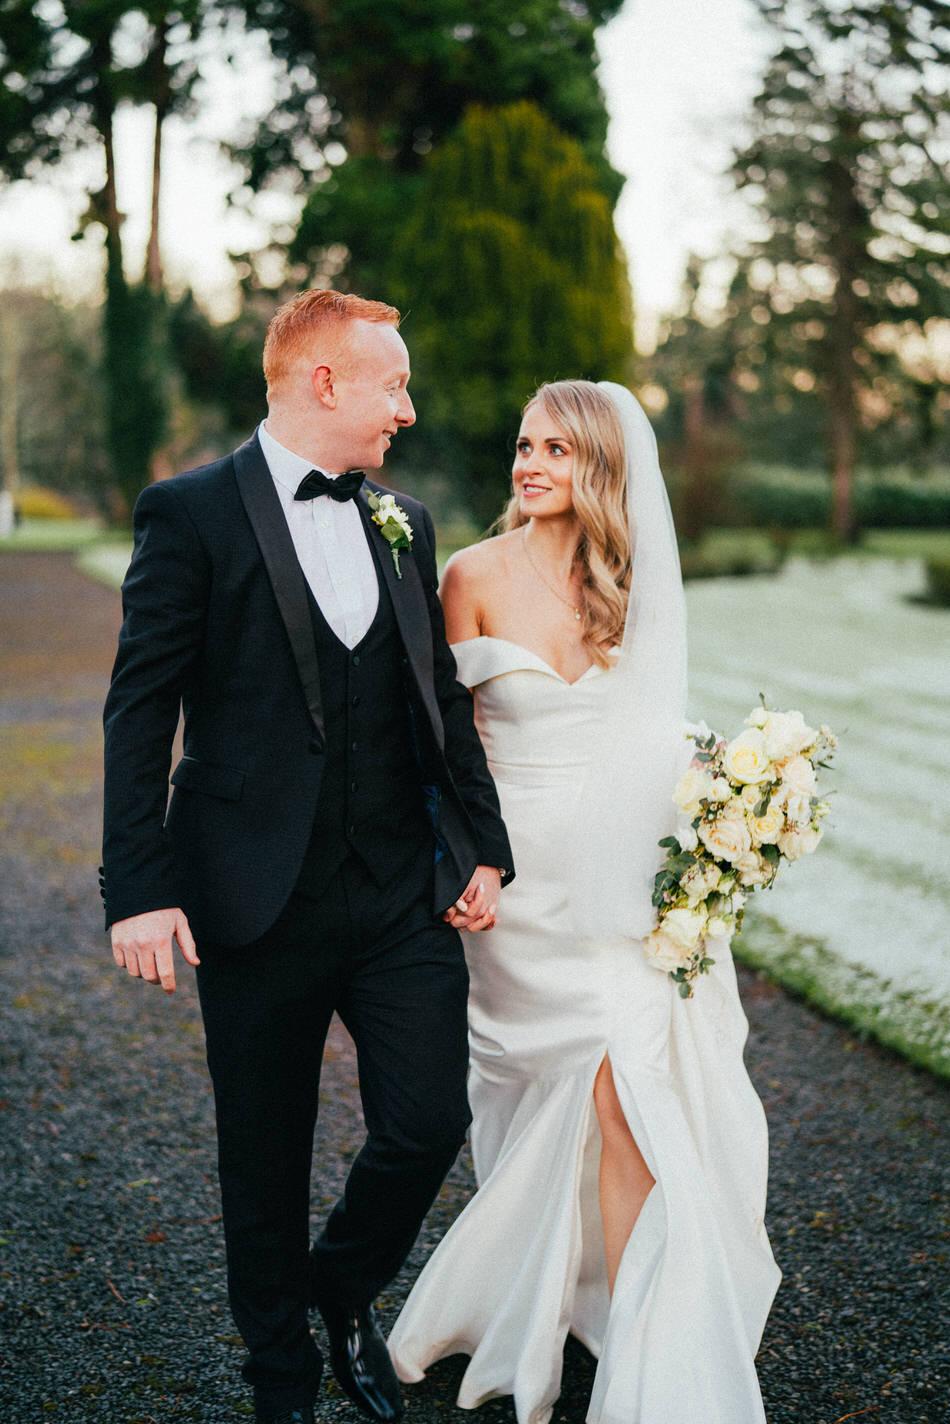 Castle-wedding-ireland-photos- 0218 158